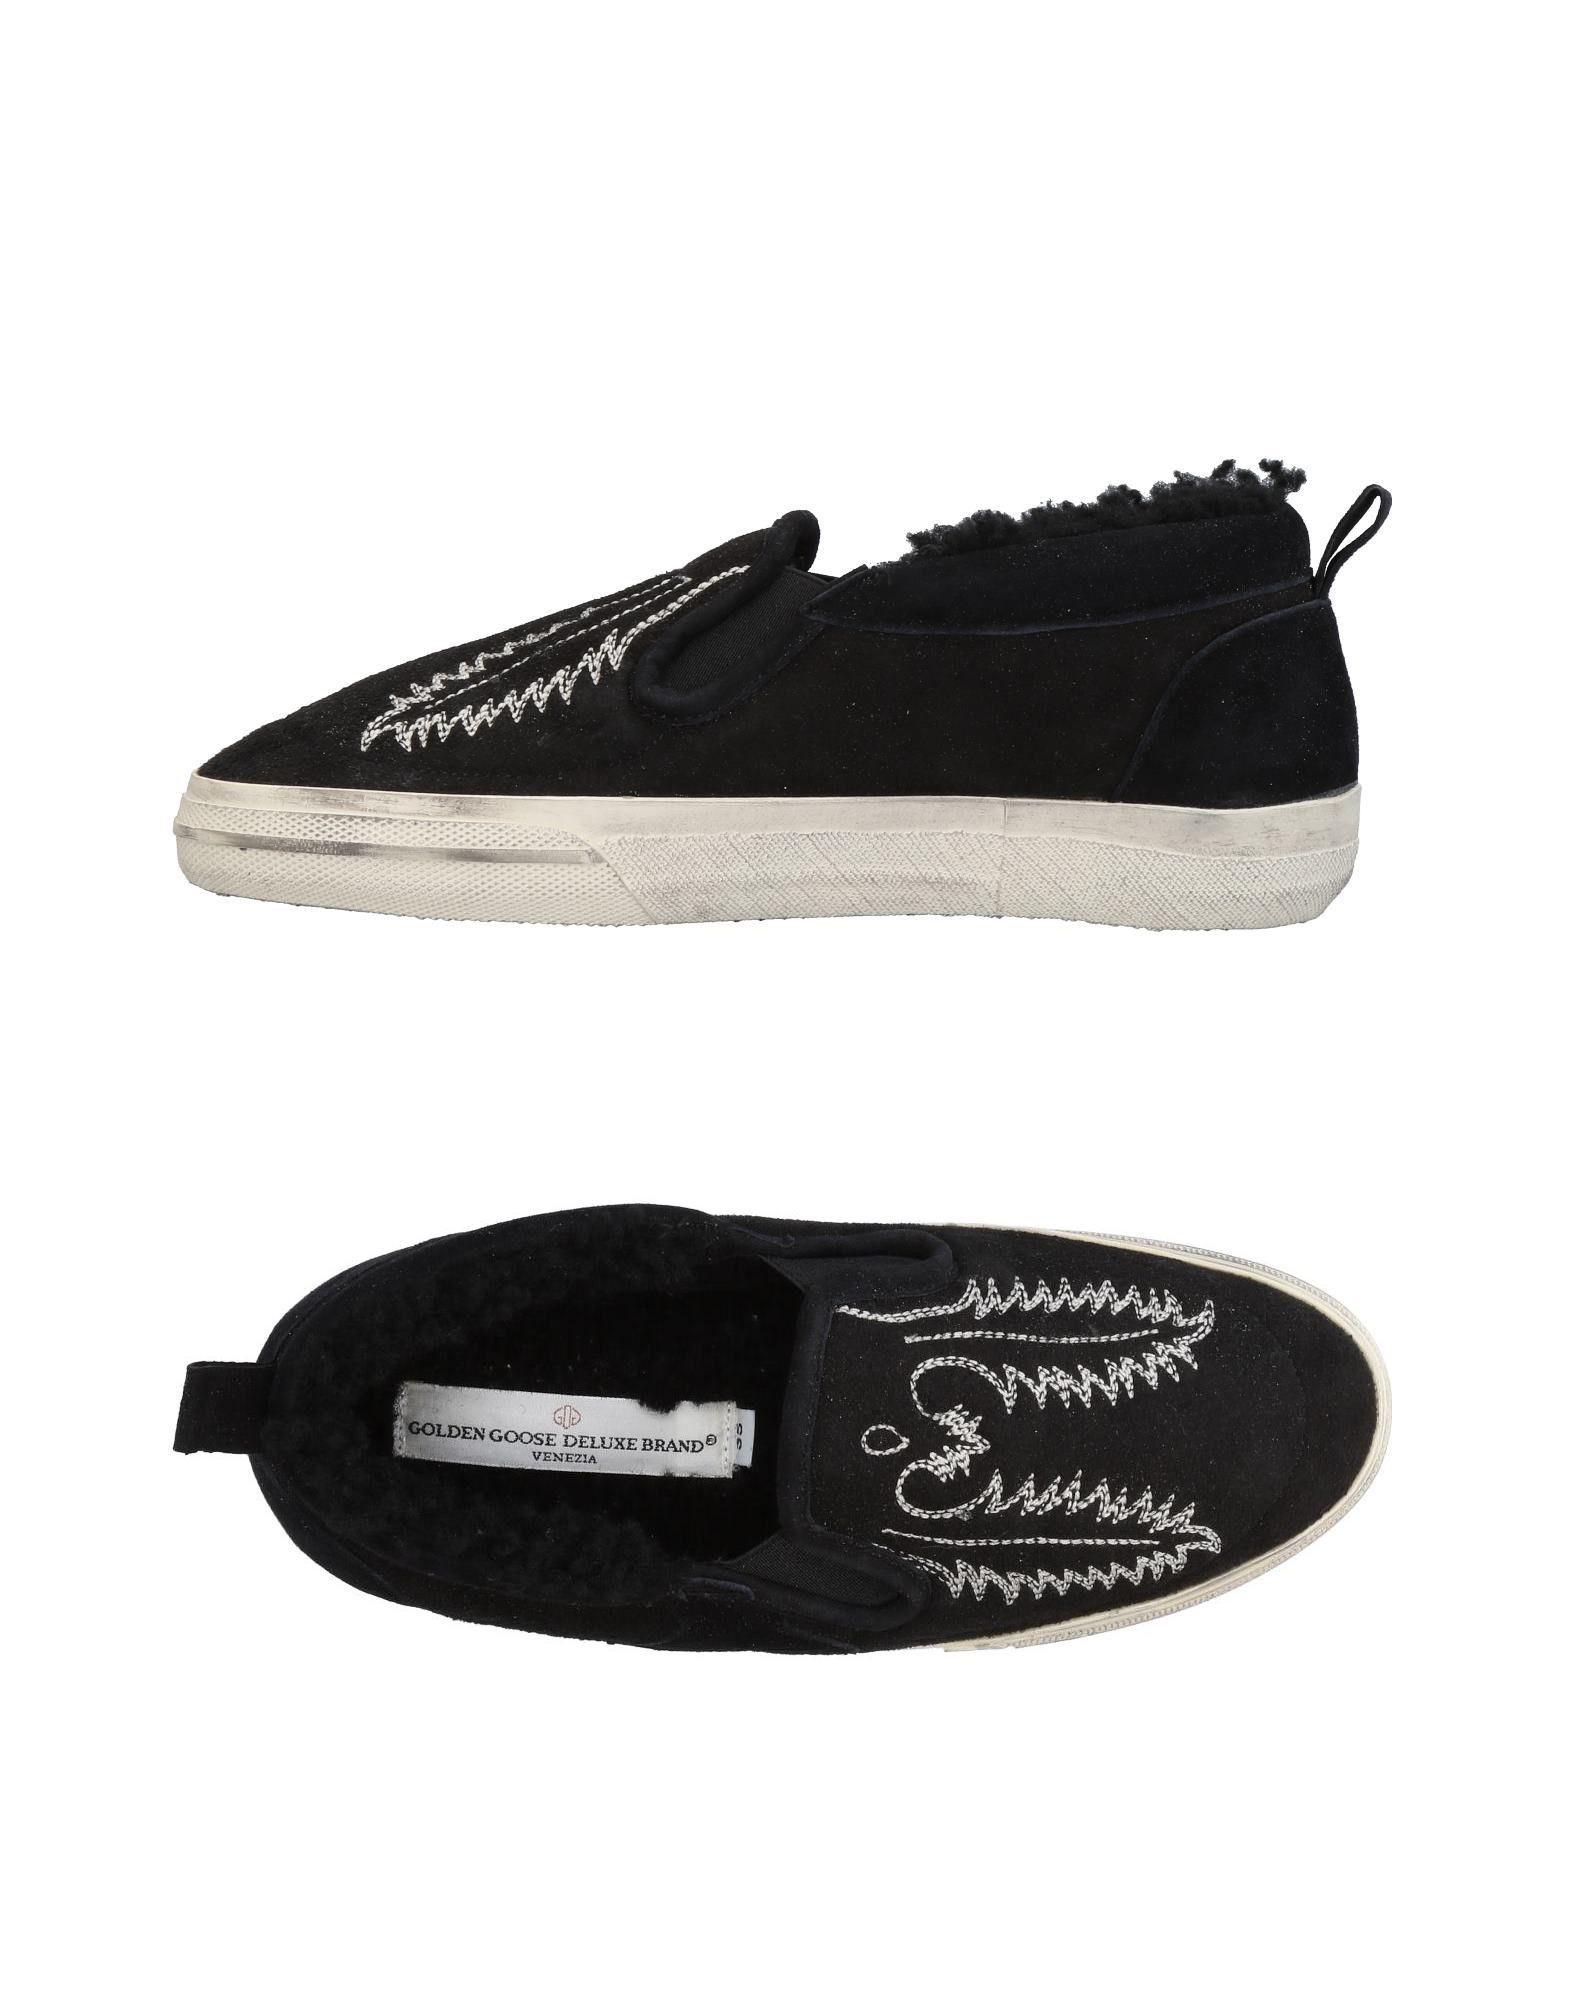 Golden Goose Deluxe Brand Sneakers Damen  11461960BAGut aussehende strapazierfähige Schuhe